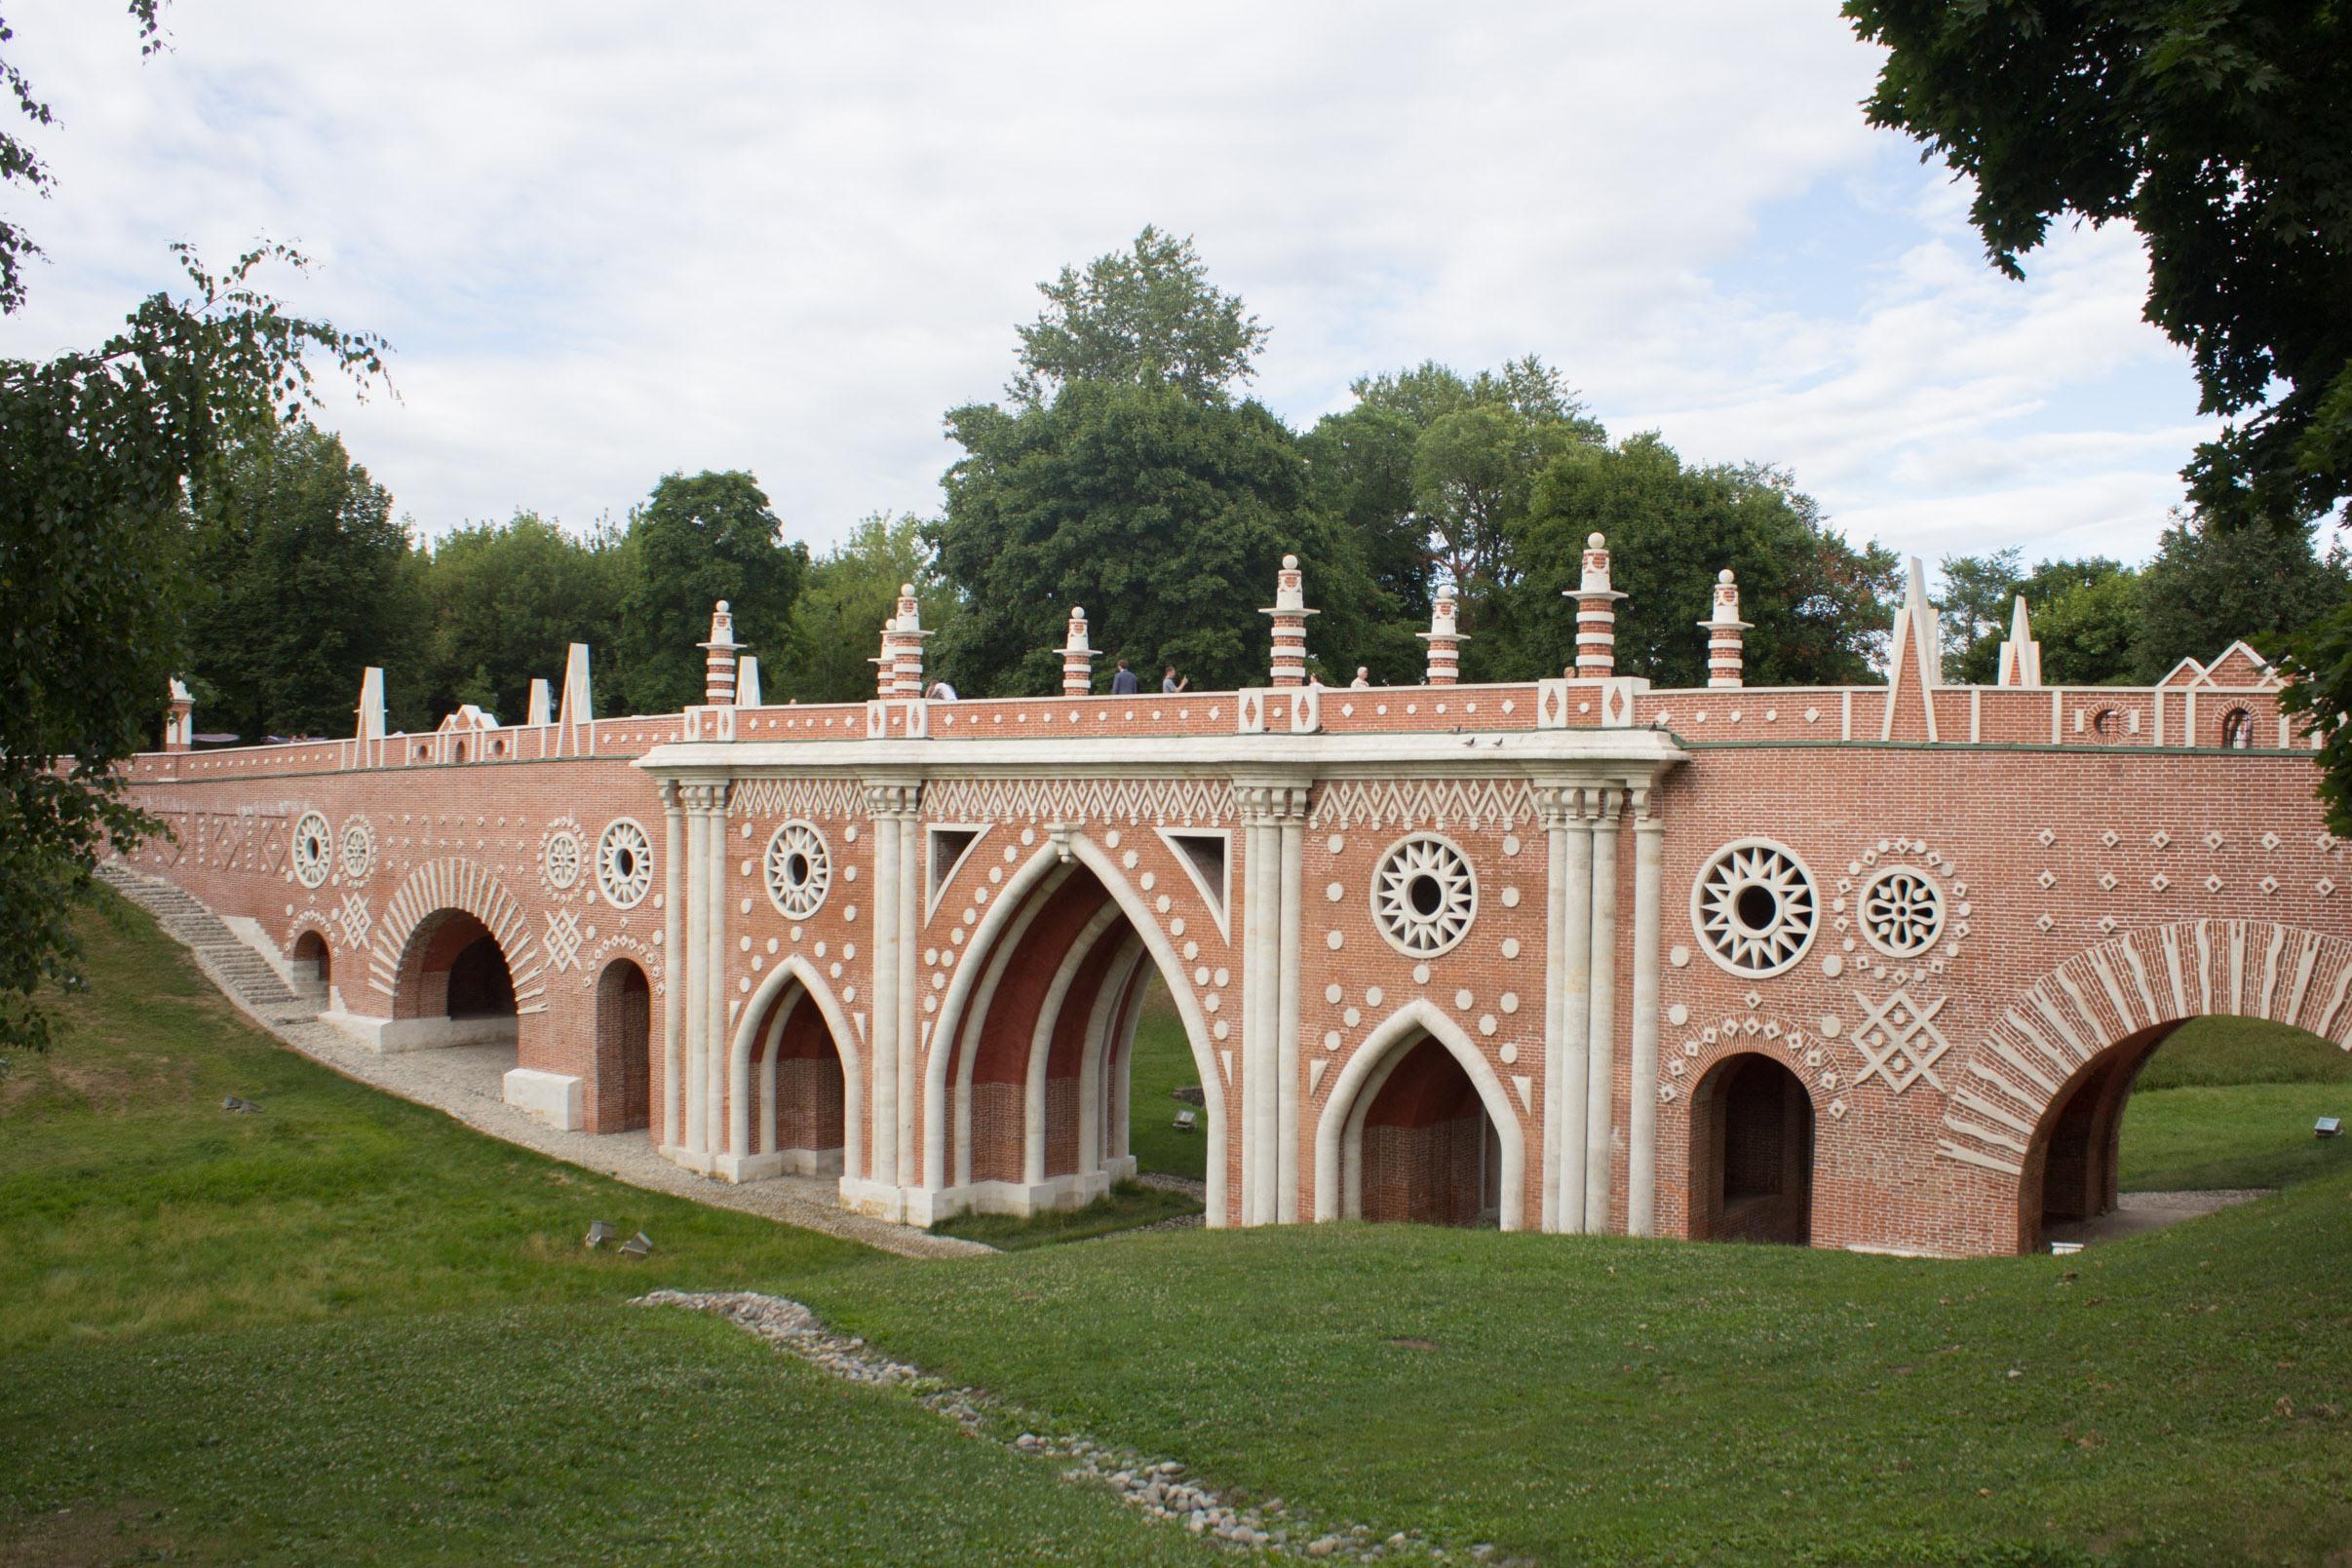 File:Царицыно. Мост через овраг 2018 01.jpg - Wikimedia Commons